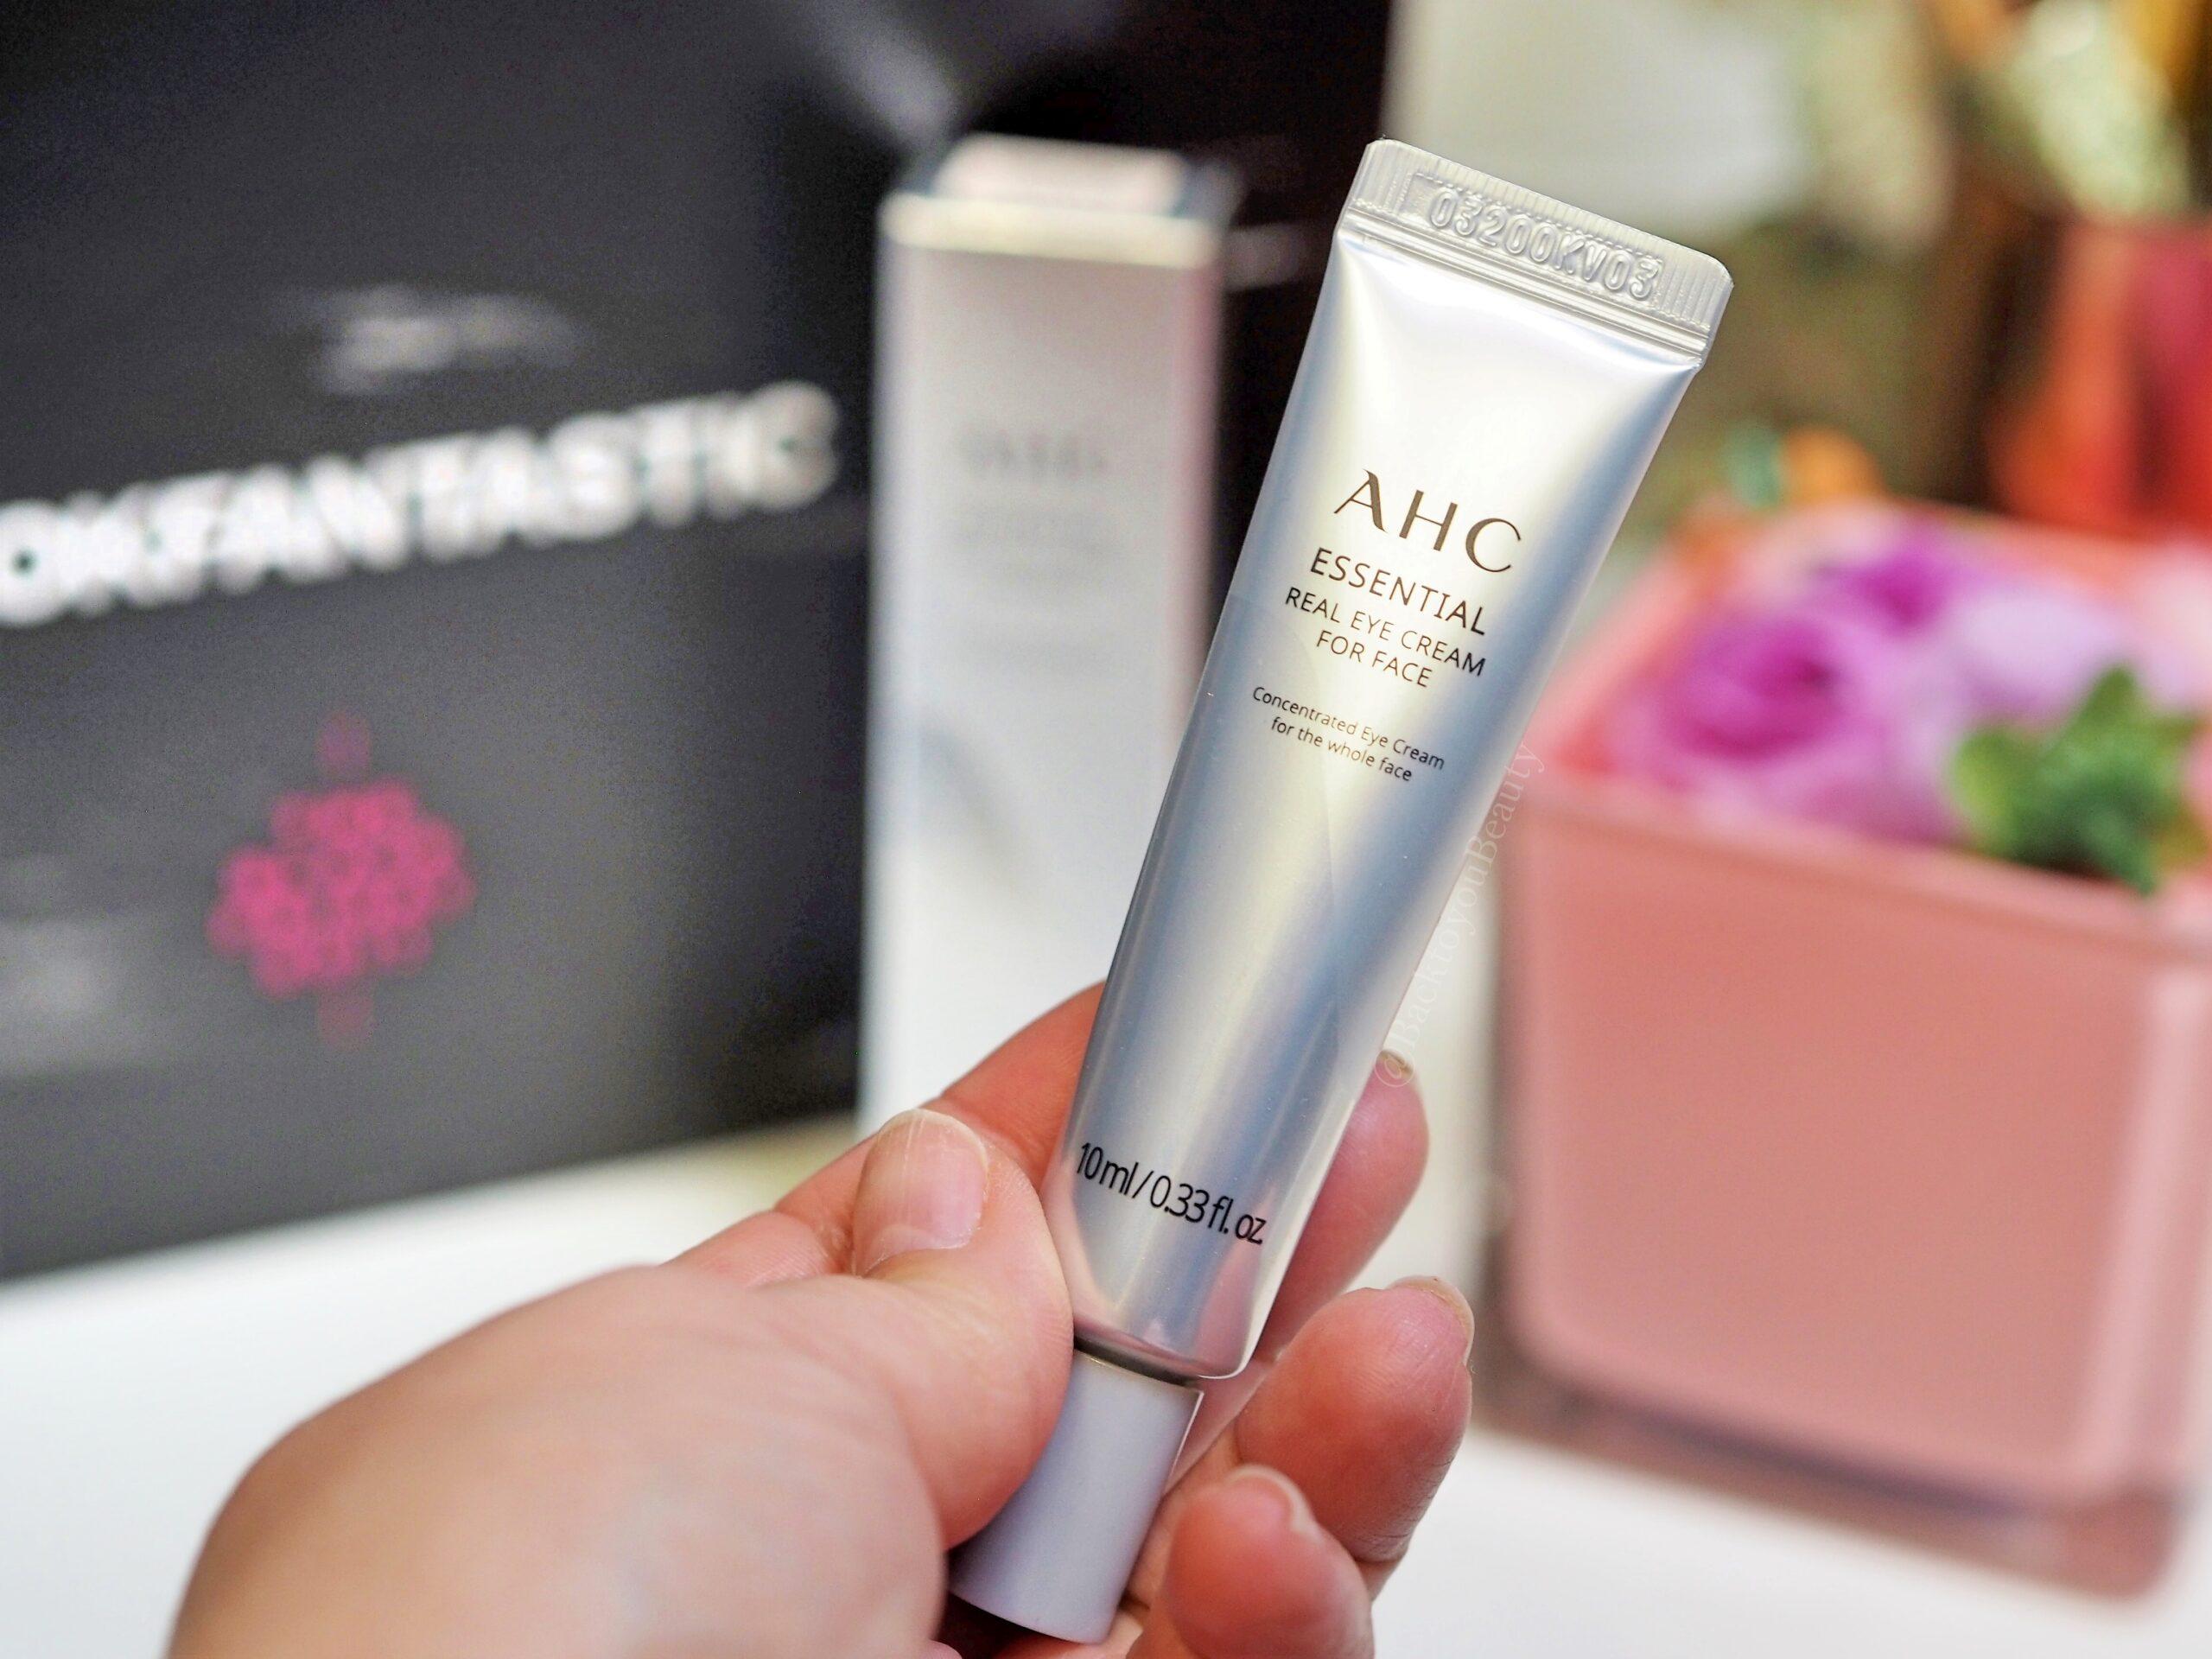 Look Fantastic Black Friday Box AHC Eye cream for face